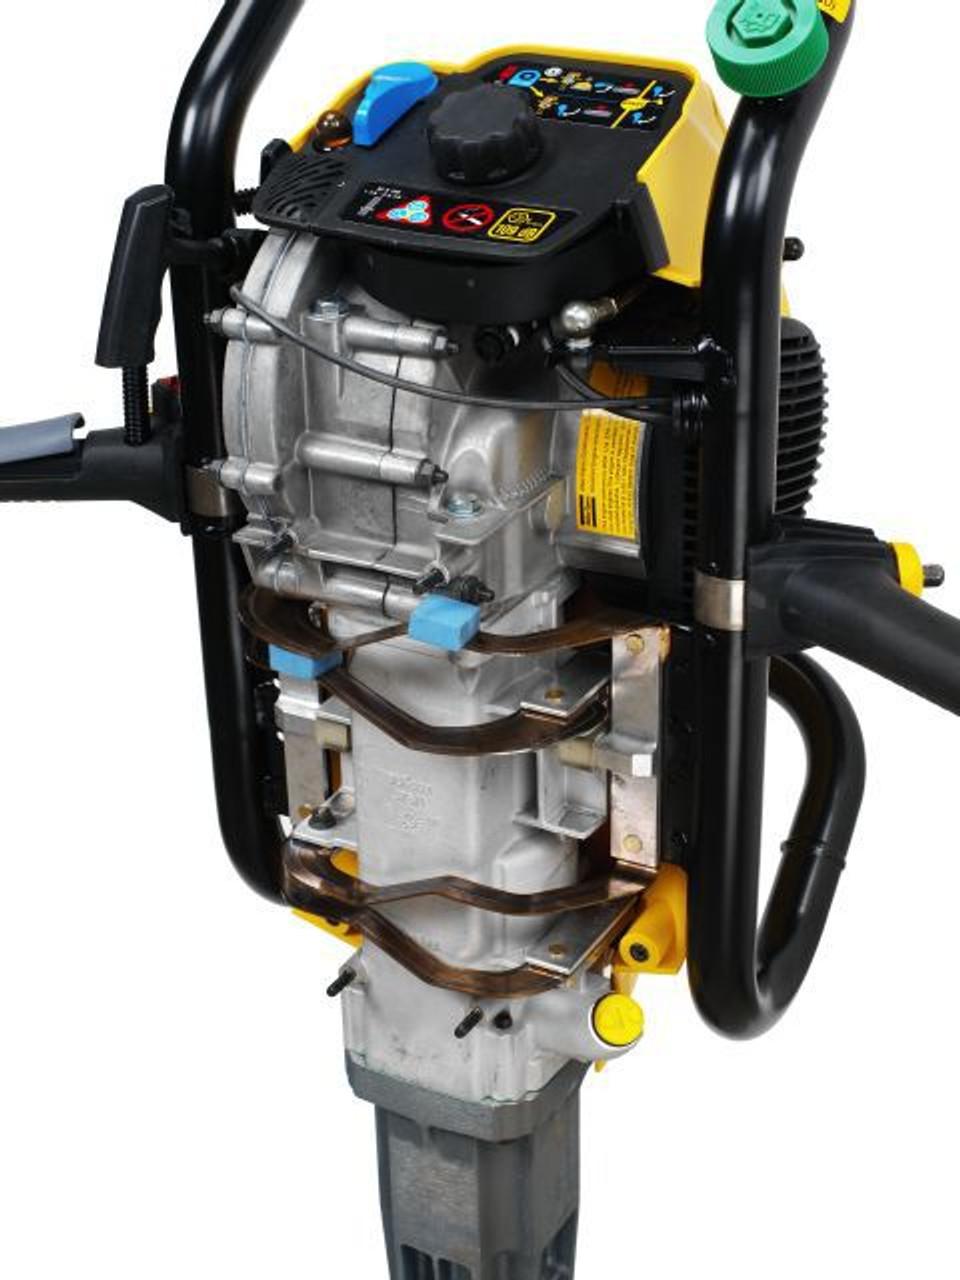 Atlas Cobra Pro Gasoline Breaker - Portable Power